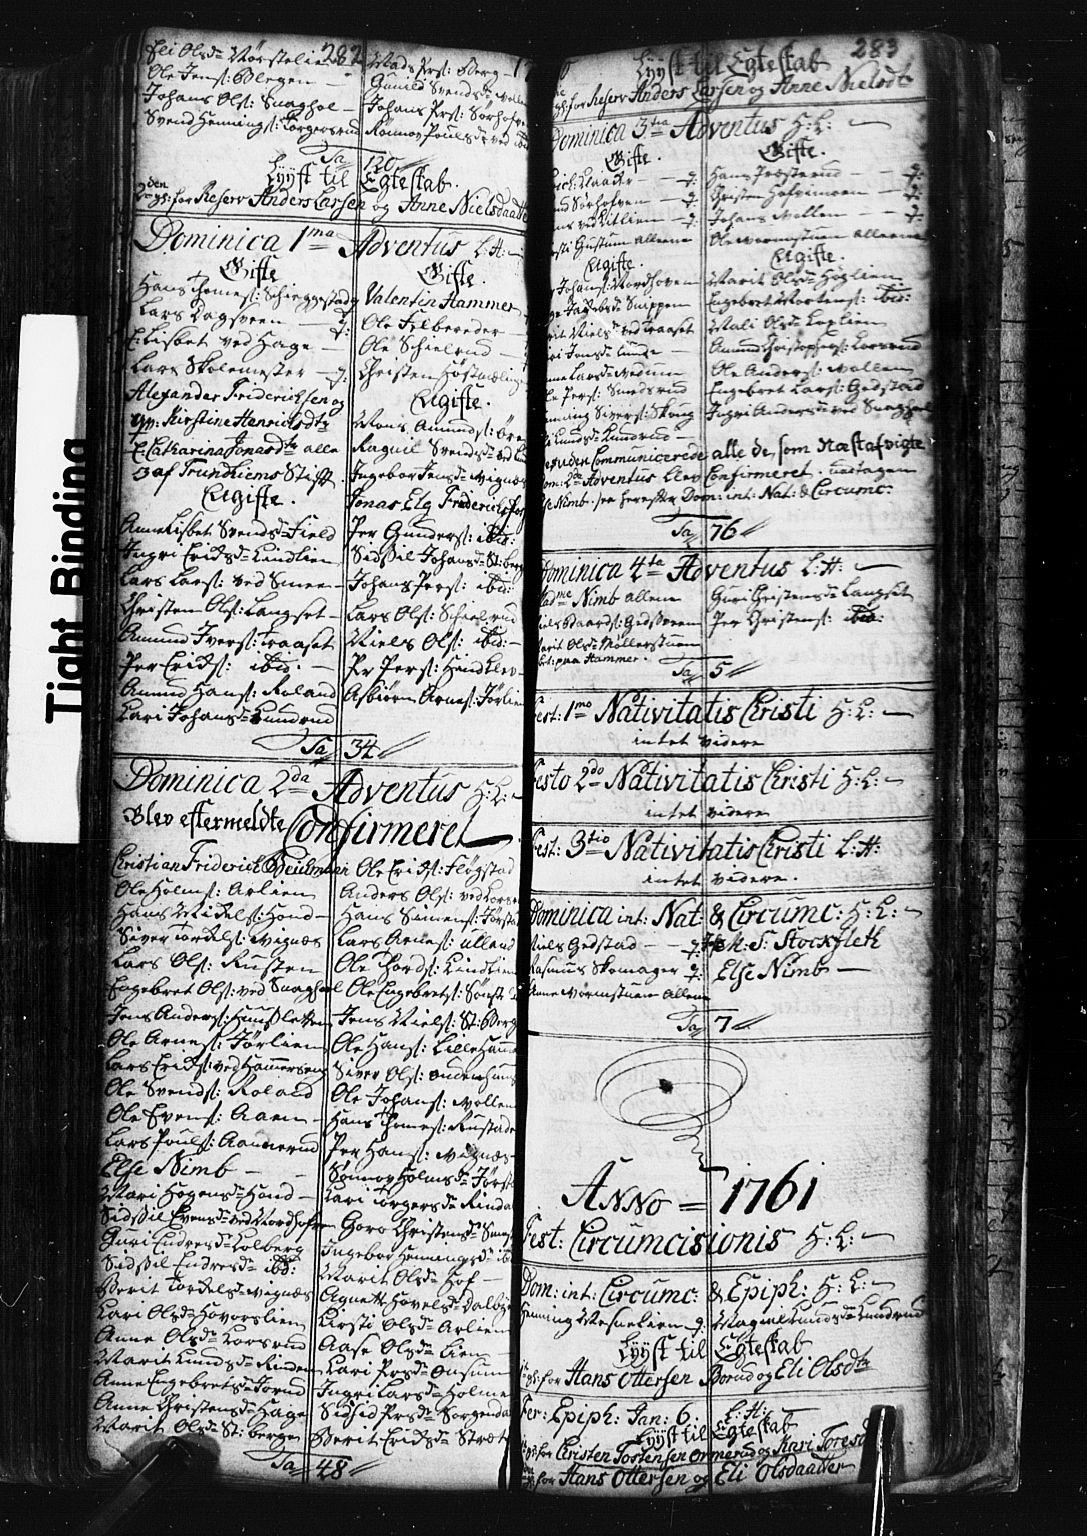 SAH, Fåberg prestekontor, Klokkerbok nr. 1, 1727-1767, s. 282-283